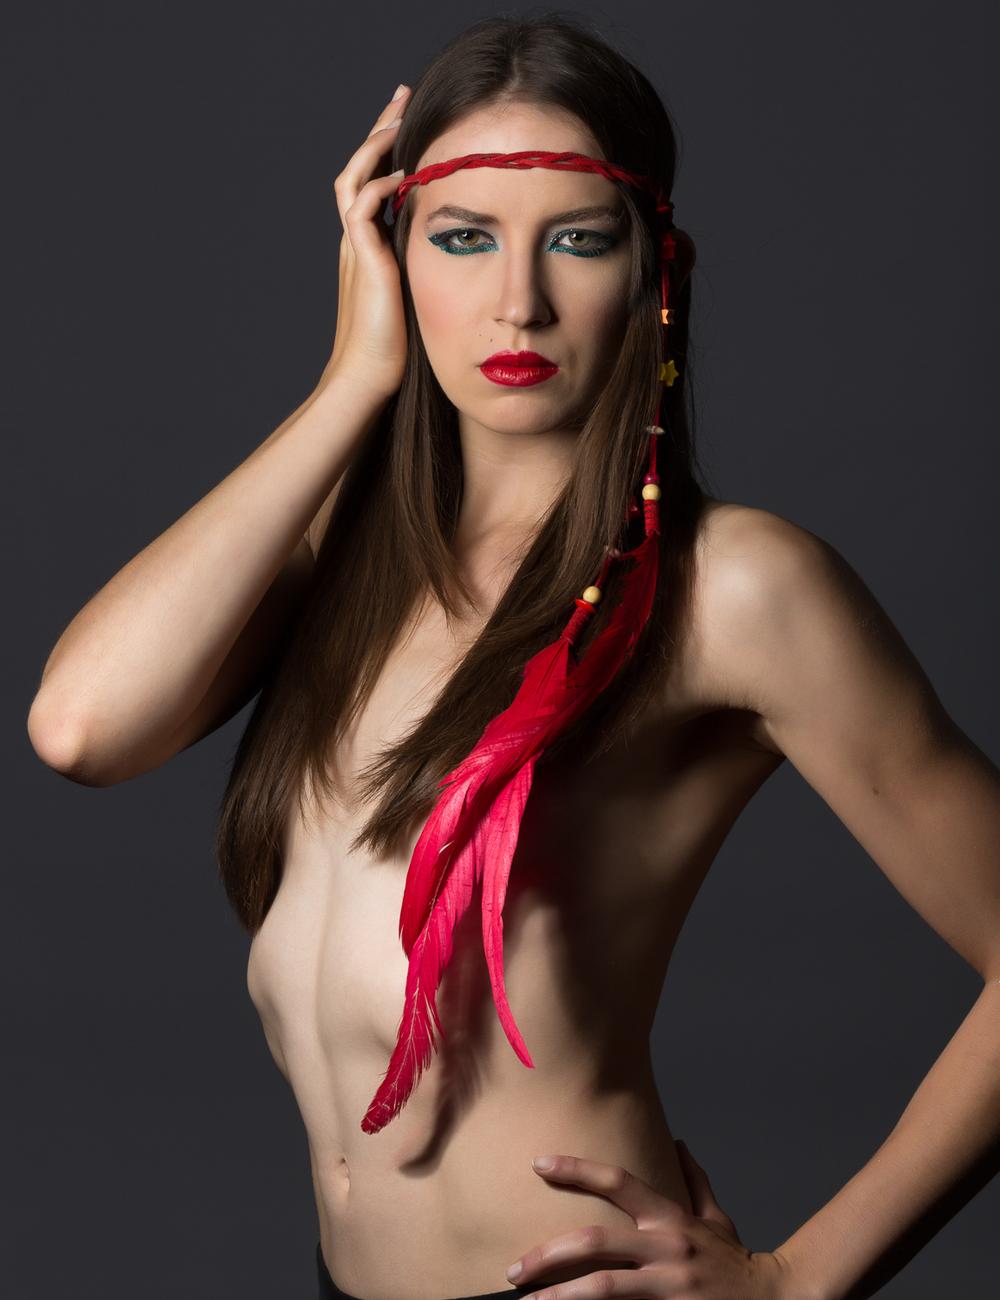 pedro-bonatto-photography-fashion-headband-sparkles.jpg